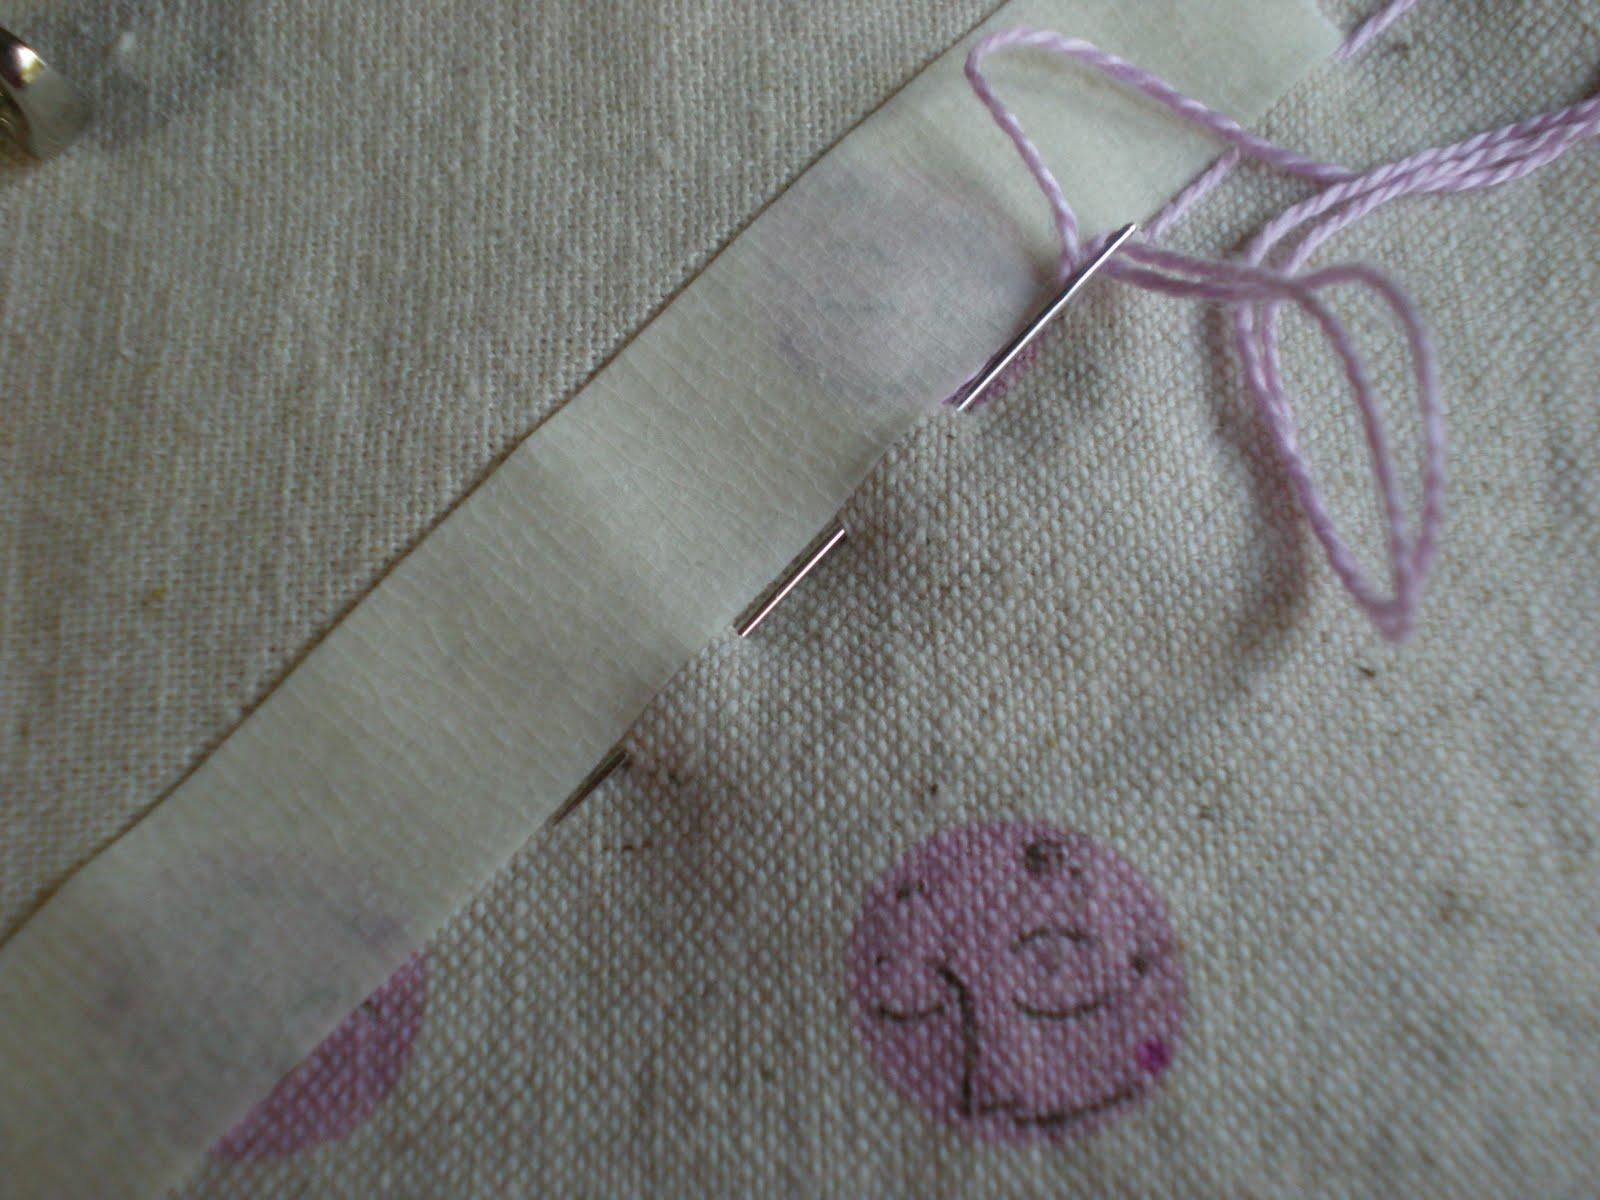 Molly Flanders Hand Quiltingpick Stitchinga Tutorial